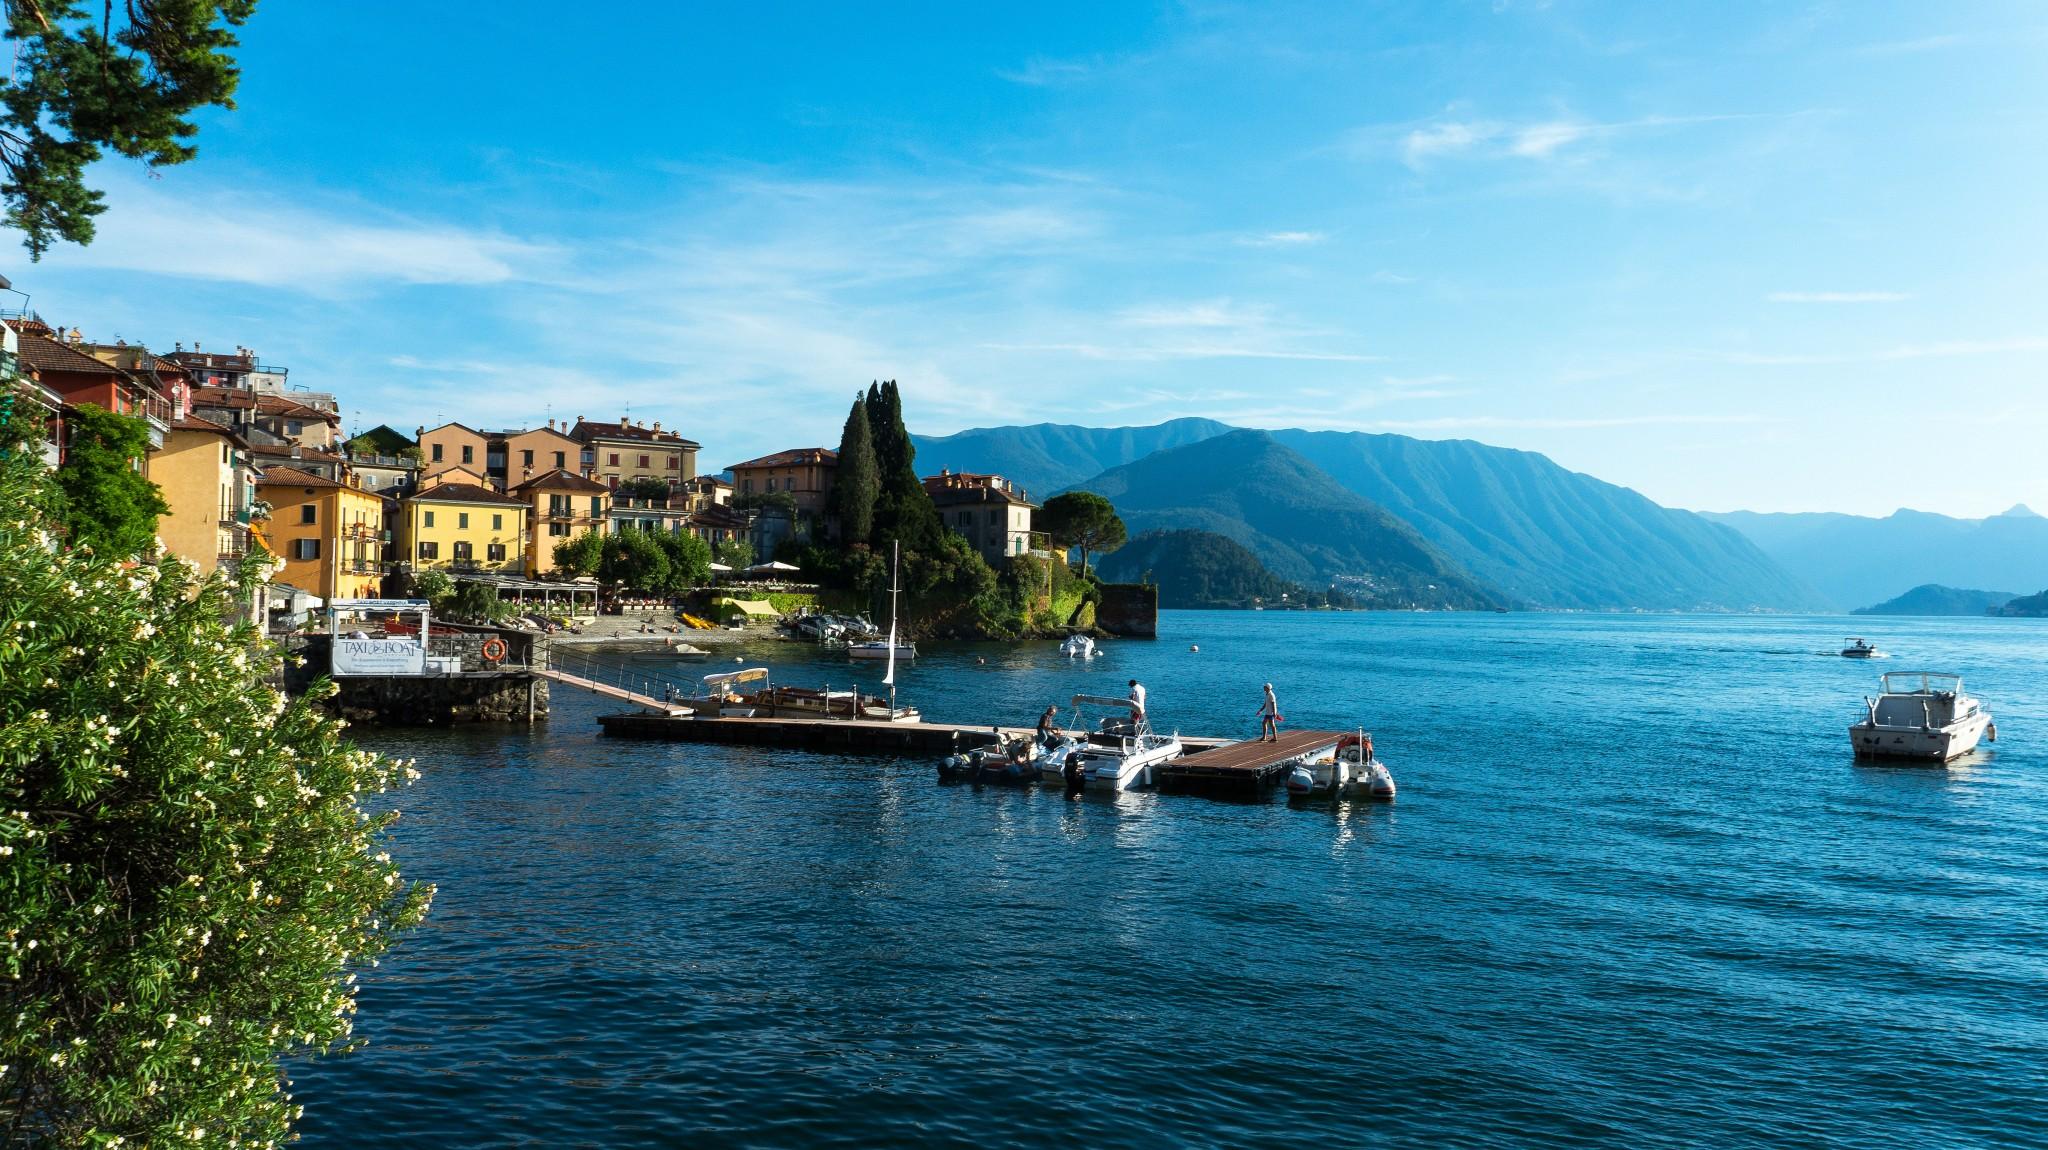 Италия: Озеро Комо - Varenna